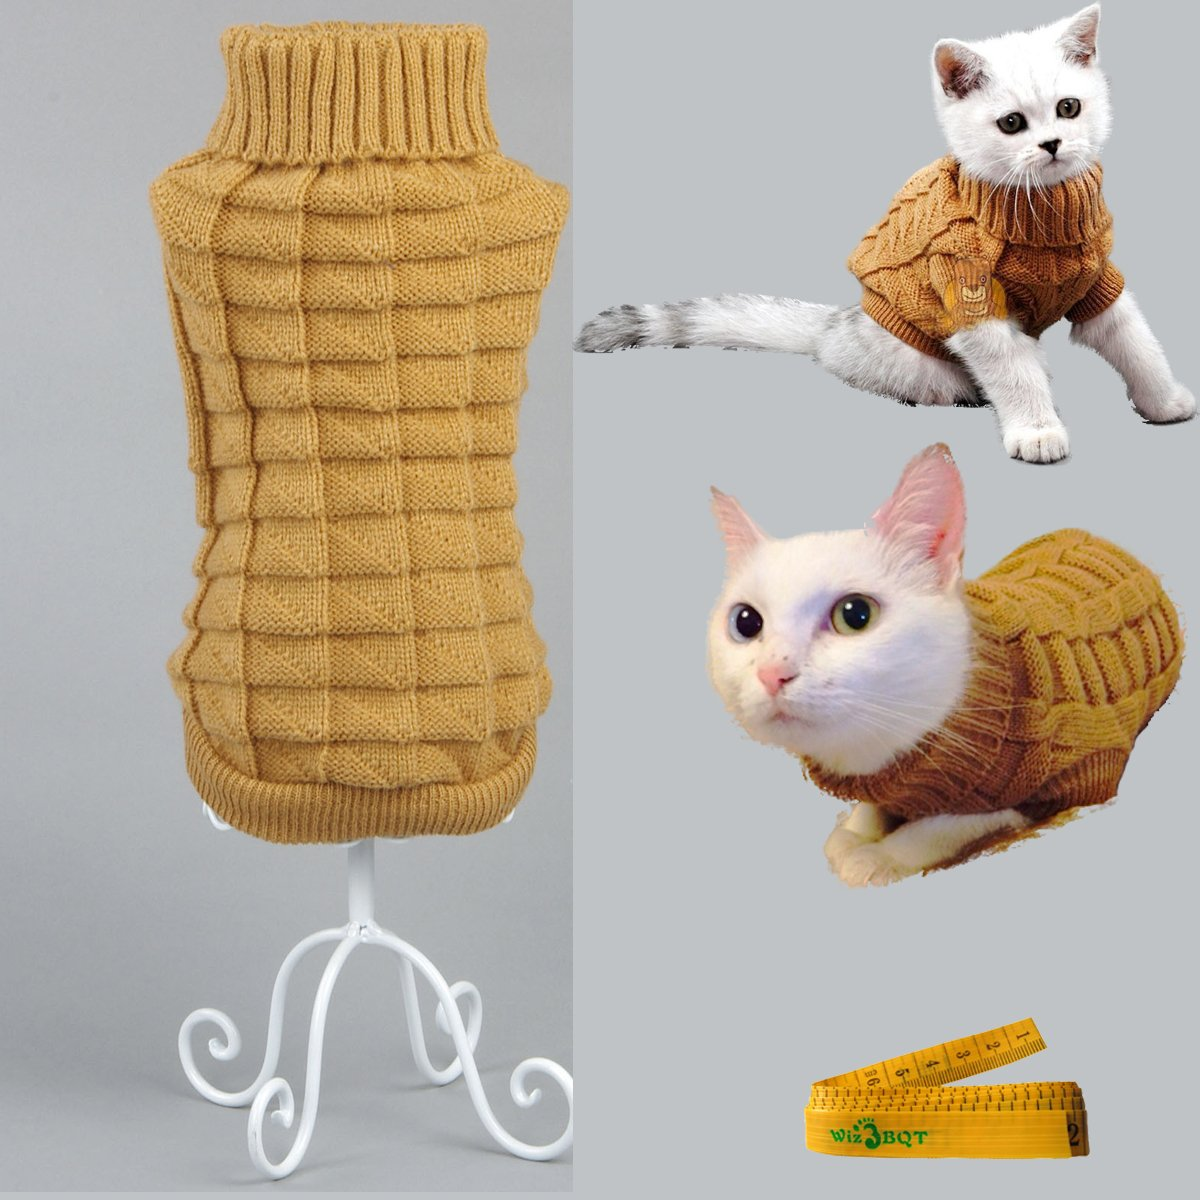 orange XS orange XS Knitted Braid Plait Turtleneck Sweater Knitwear Outerwear for Dogs & Cats